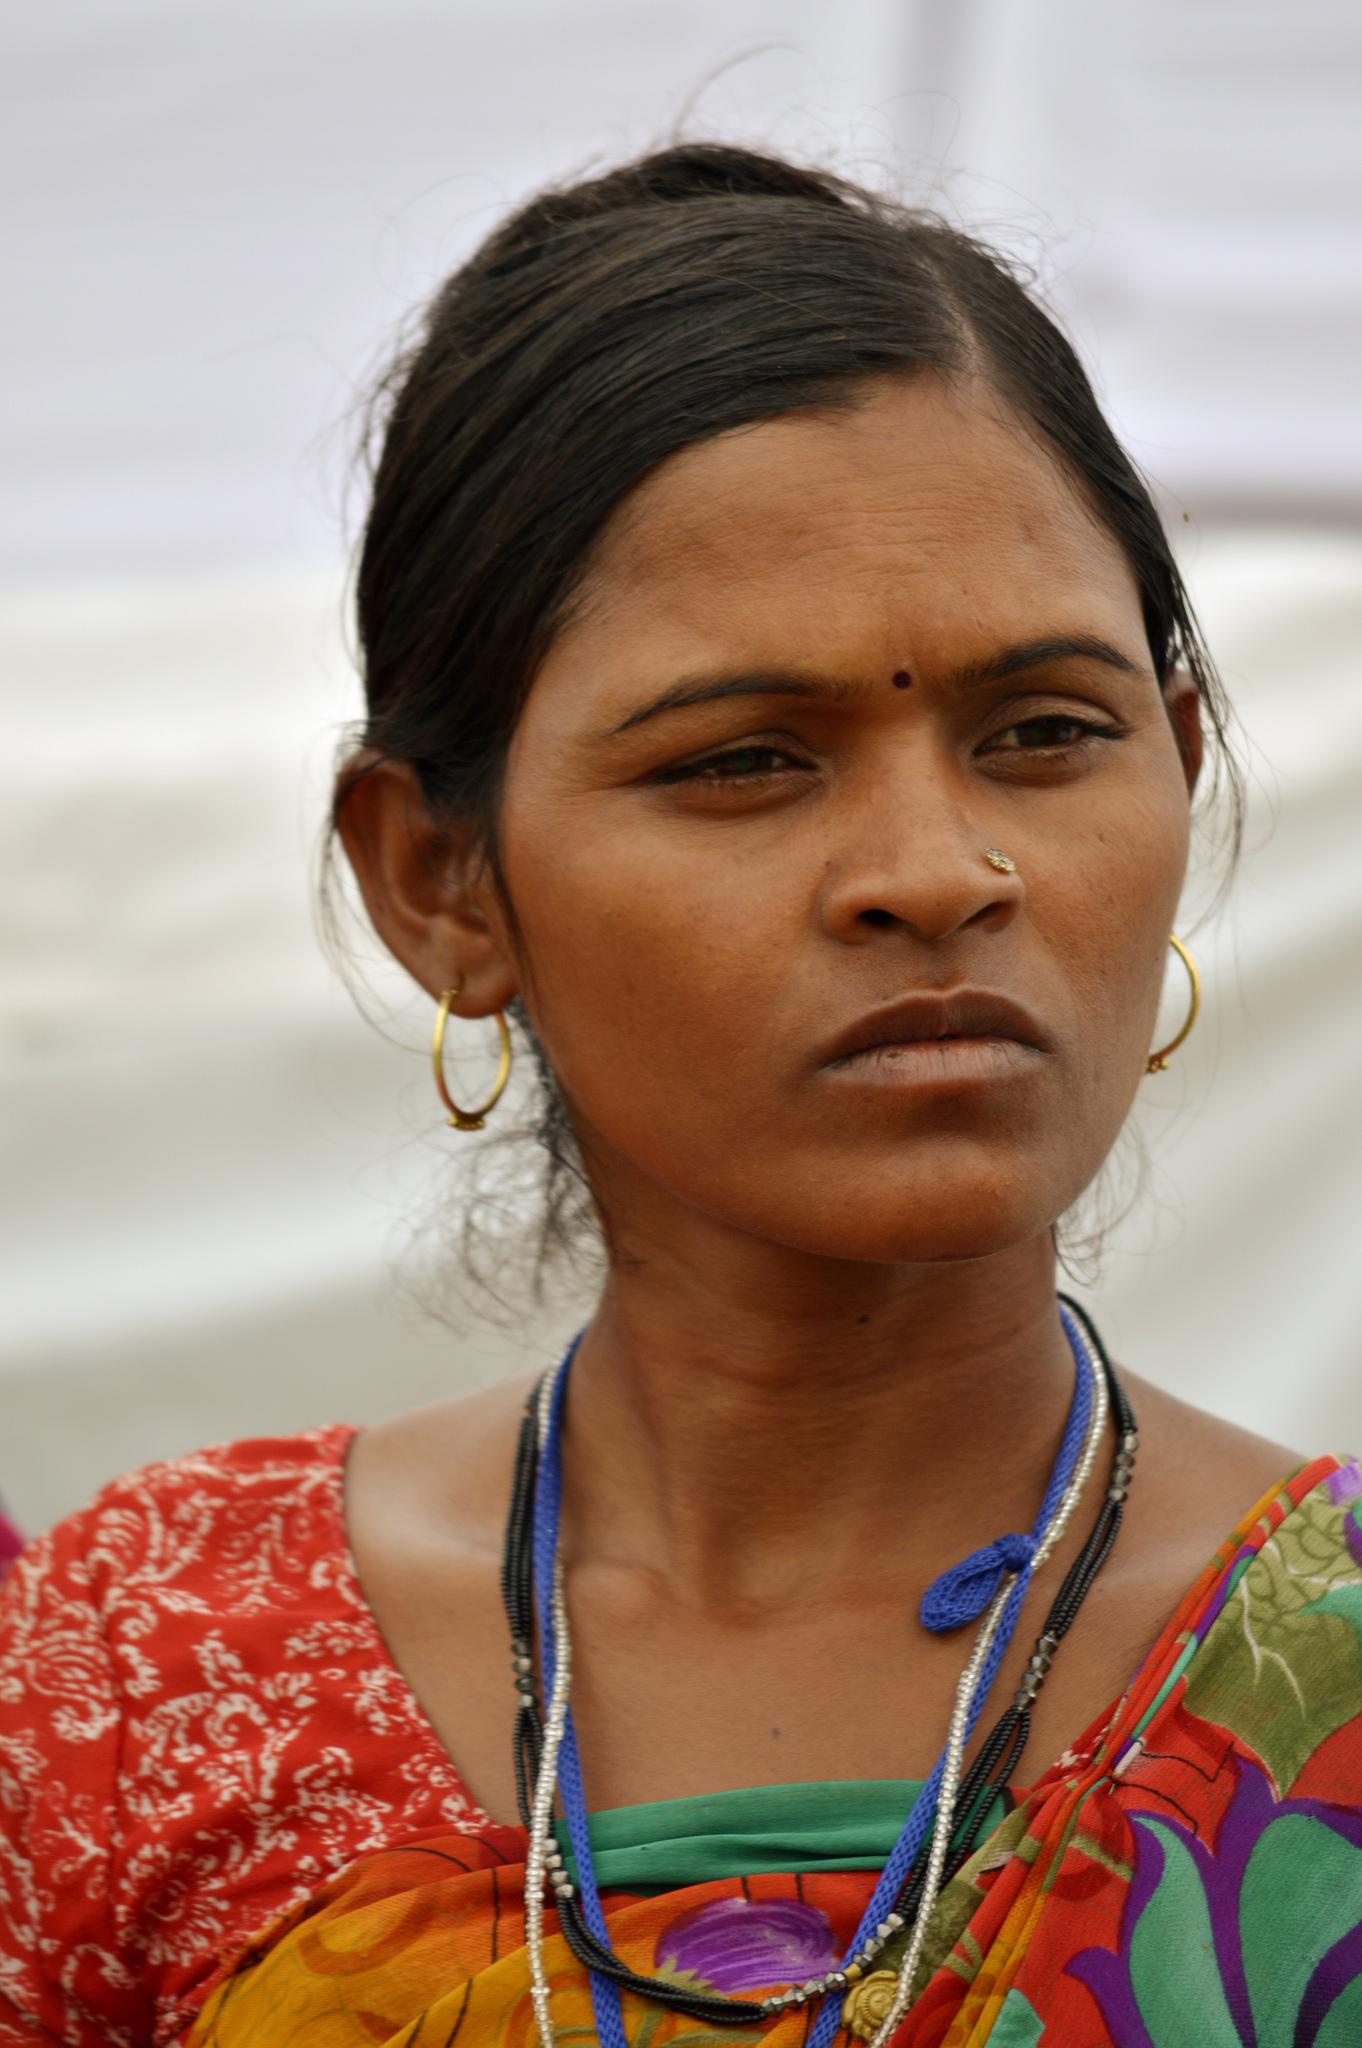 Indian Woman In Black Saree: File:India Woman, Jan Satyagraha, Agra.jpg